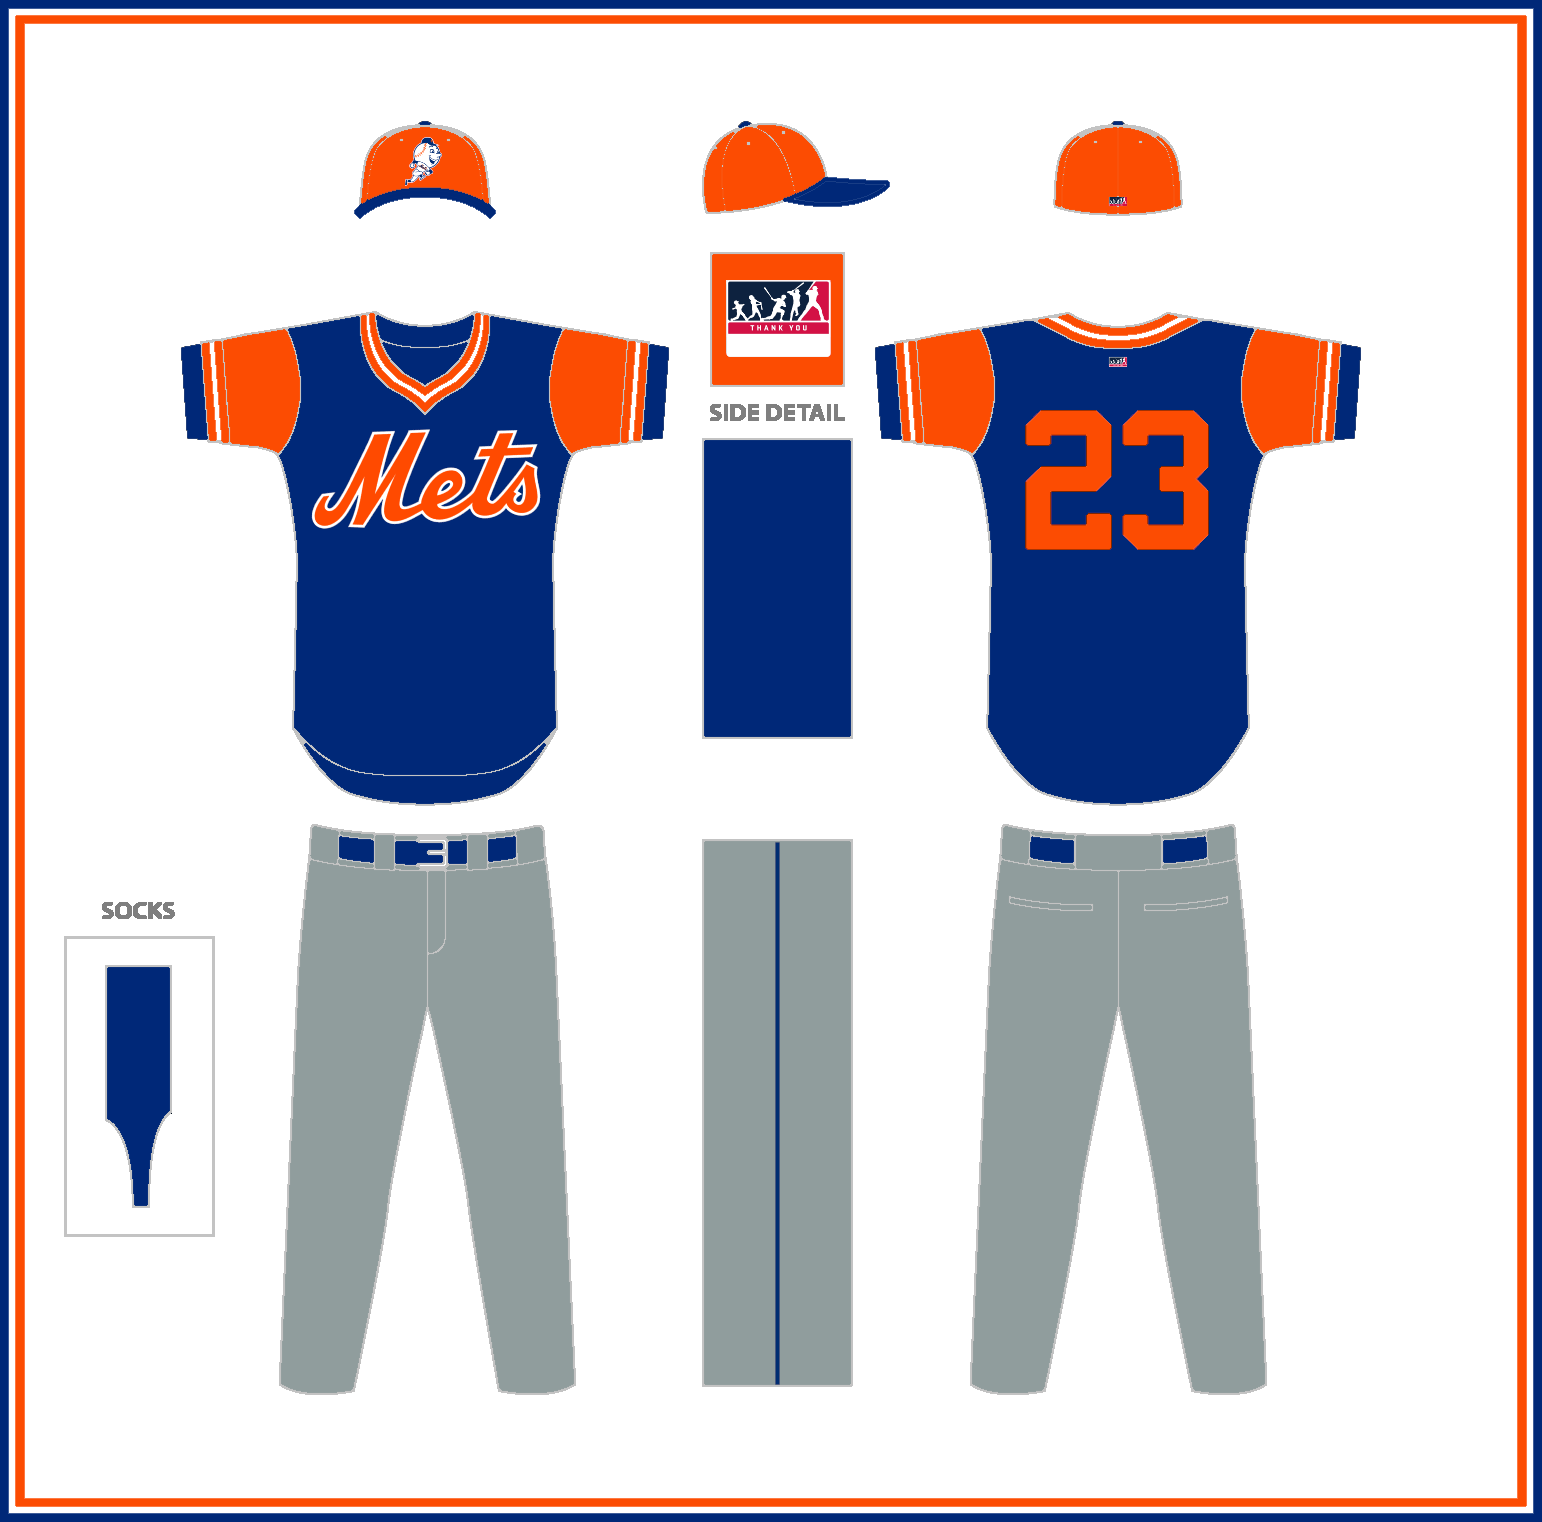 Mets_Players_Weekend_Template.png